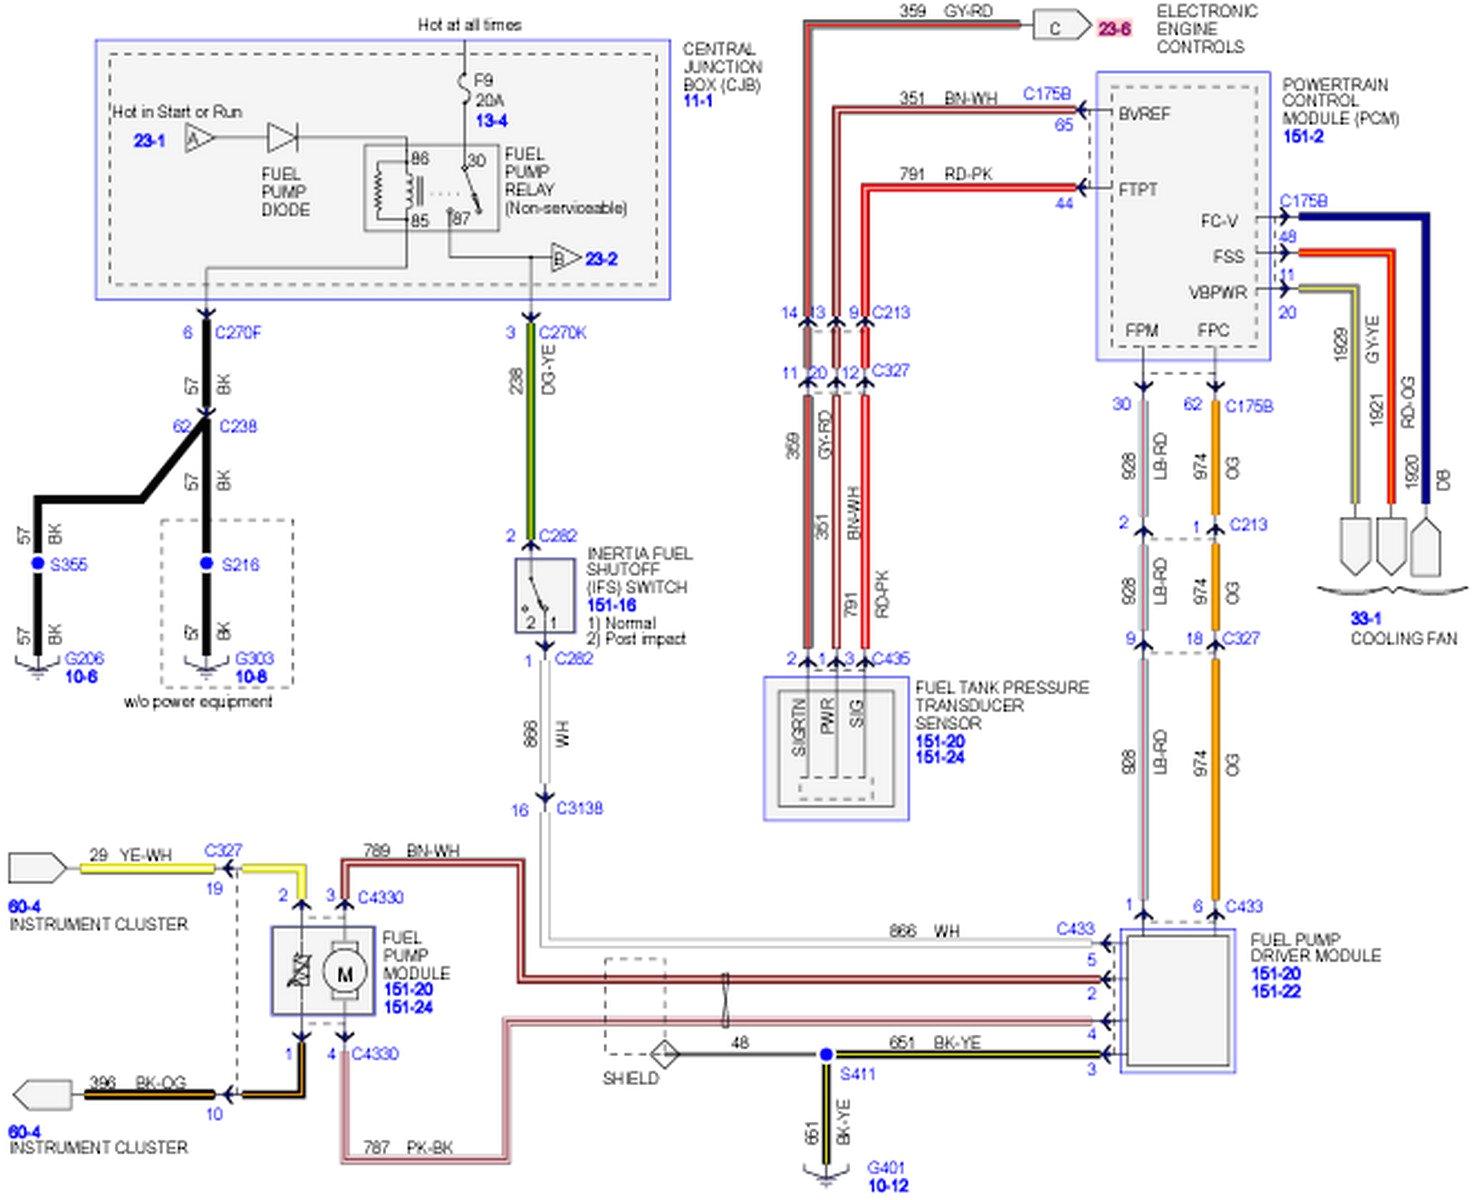 f fuel system wiring diagram wiring diagrams konsult f fuel system wiring diagram